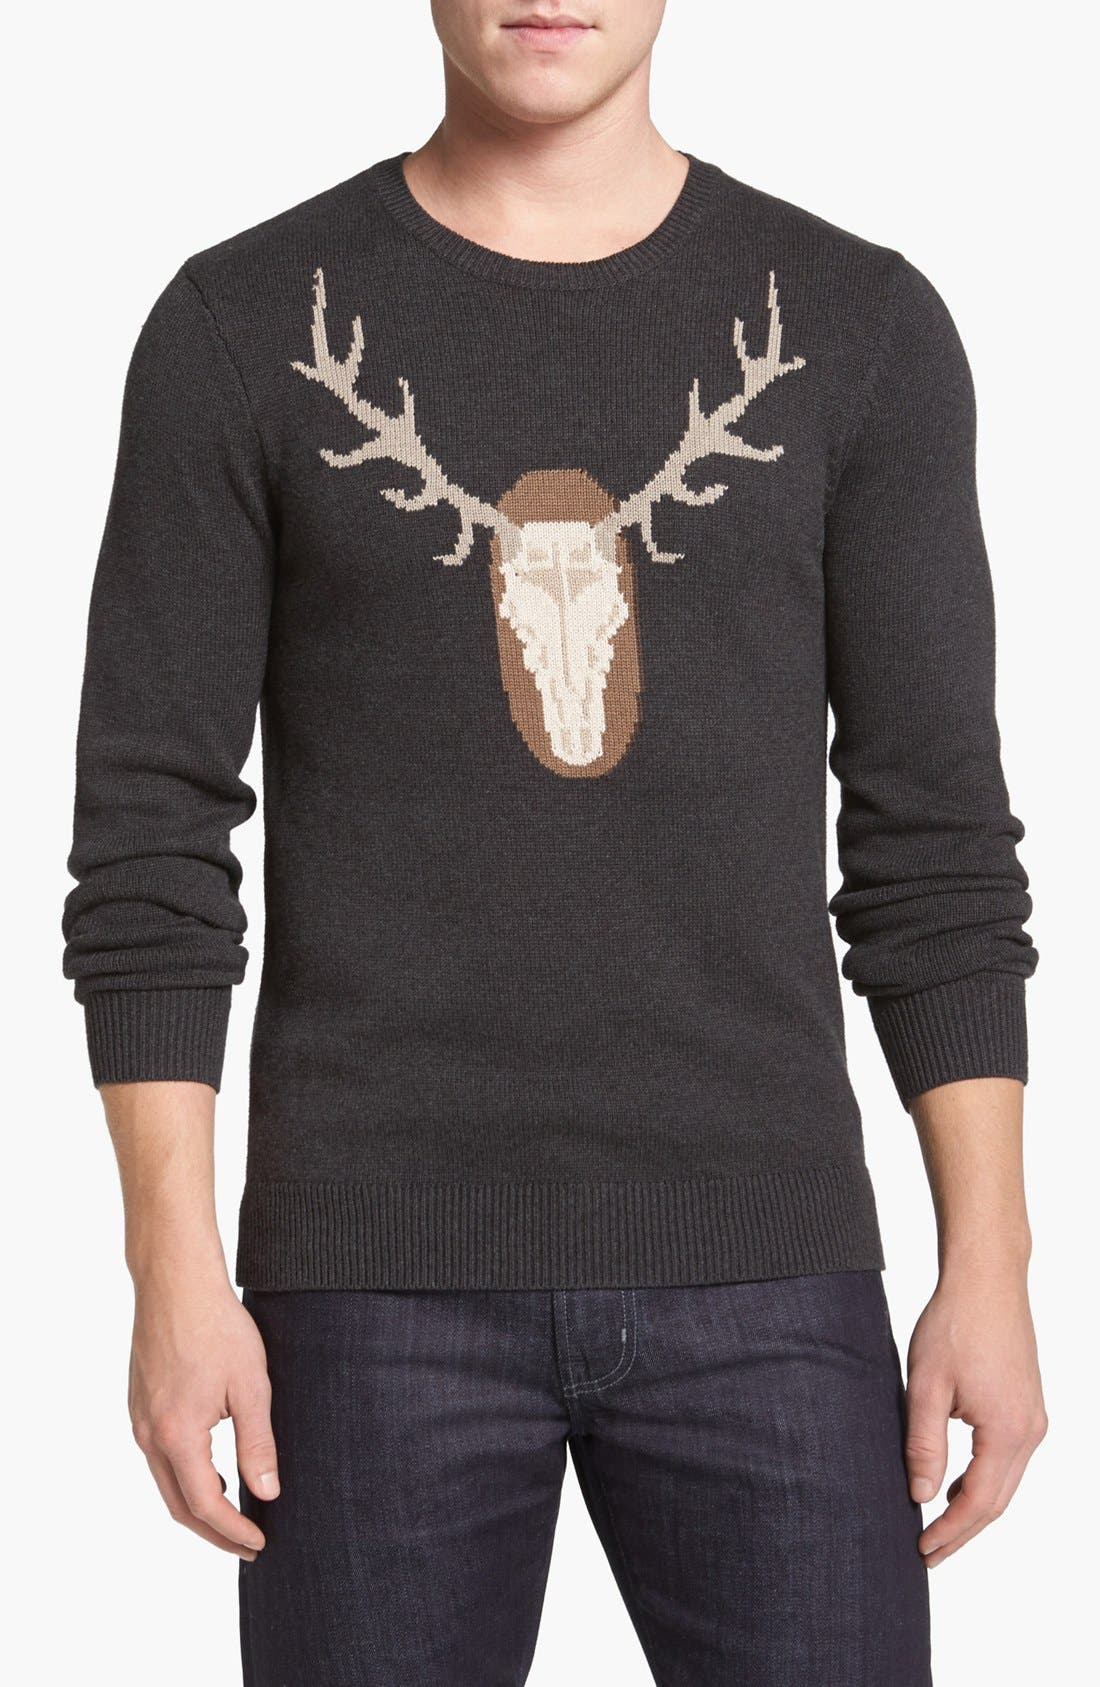 Main Image - 1901 Graphic Crewneck Sweater